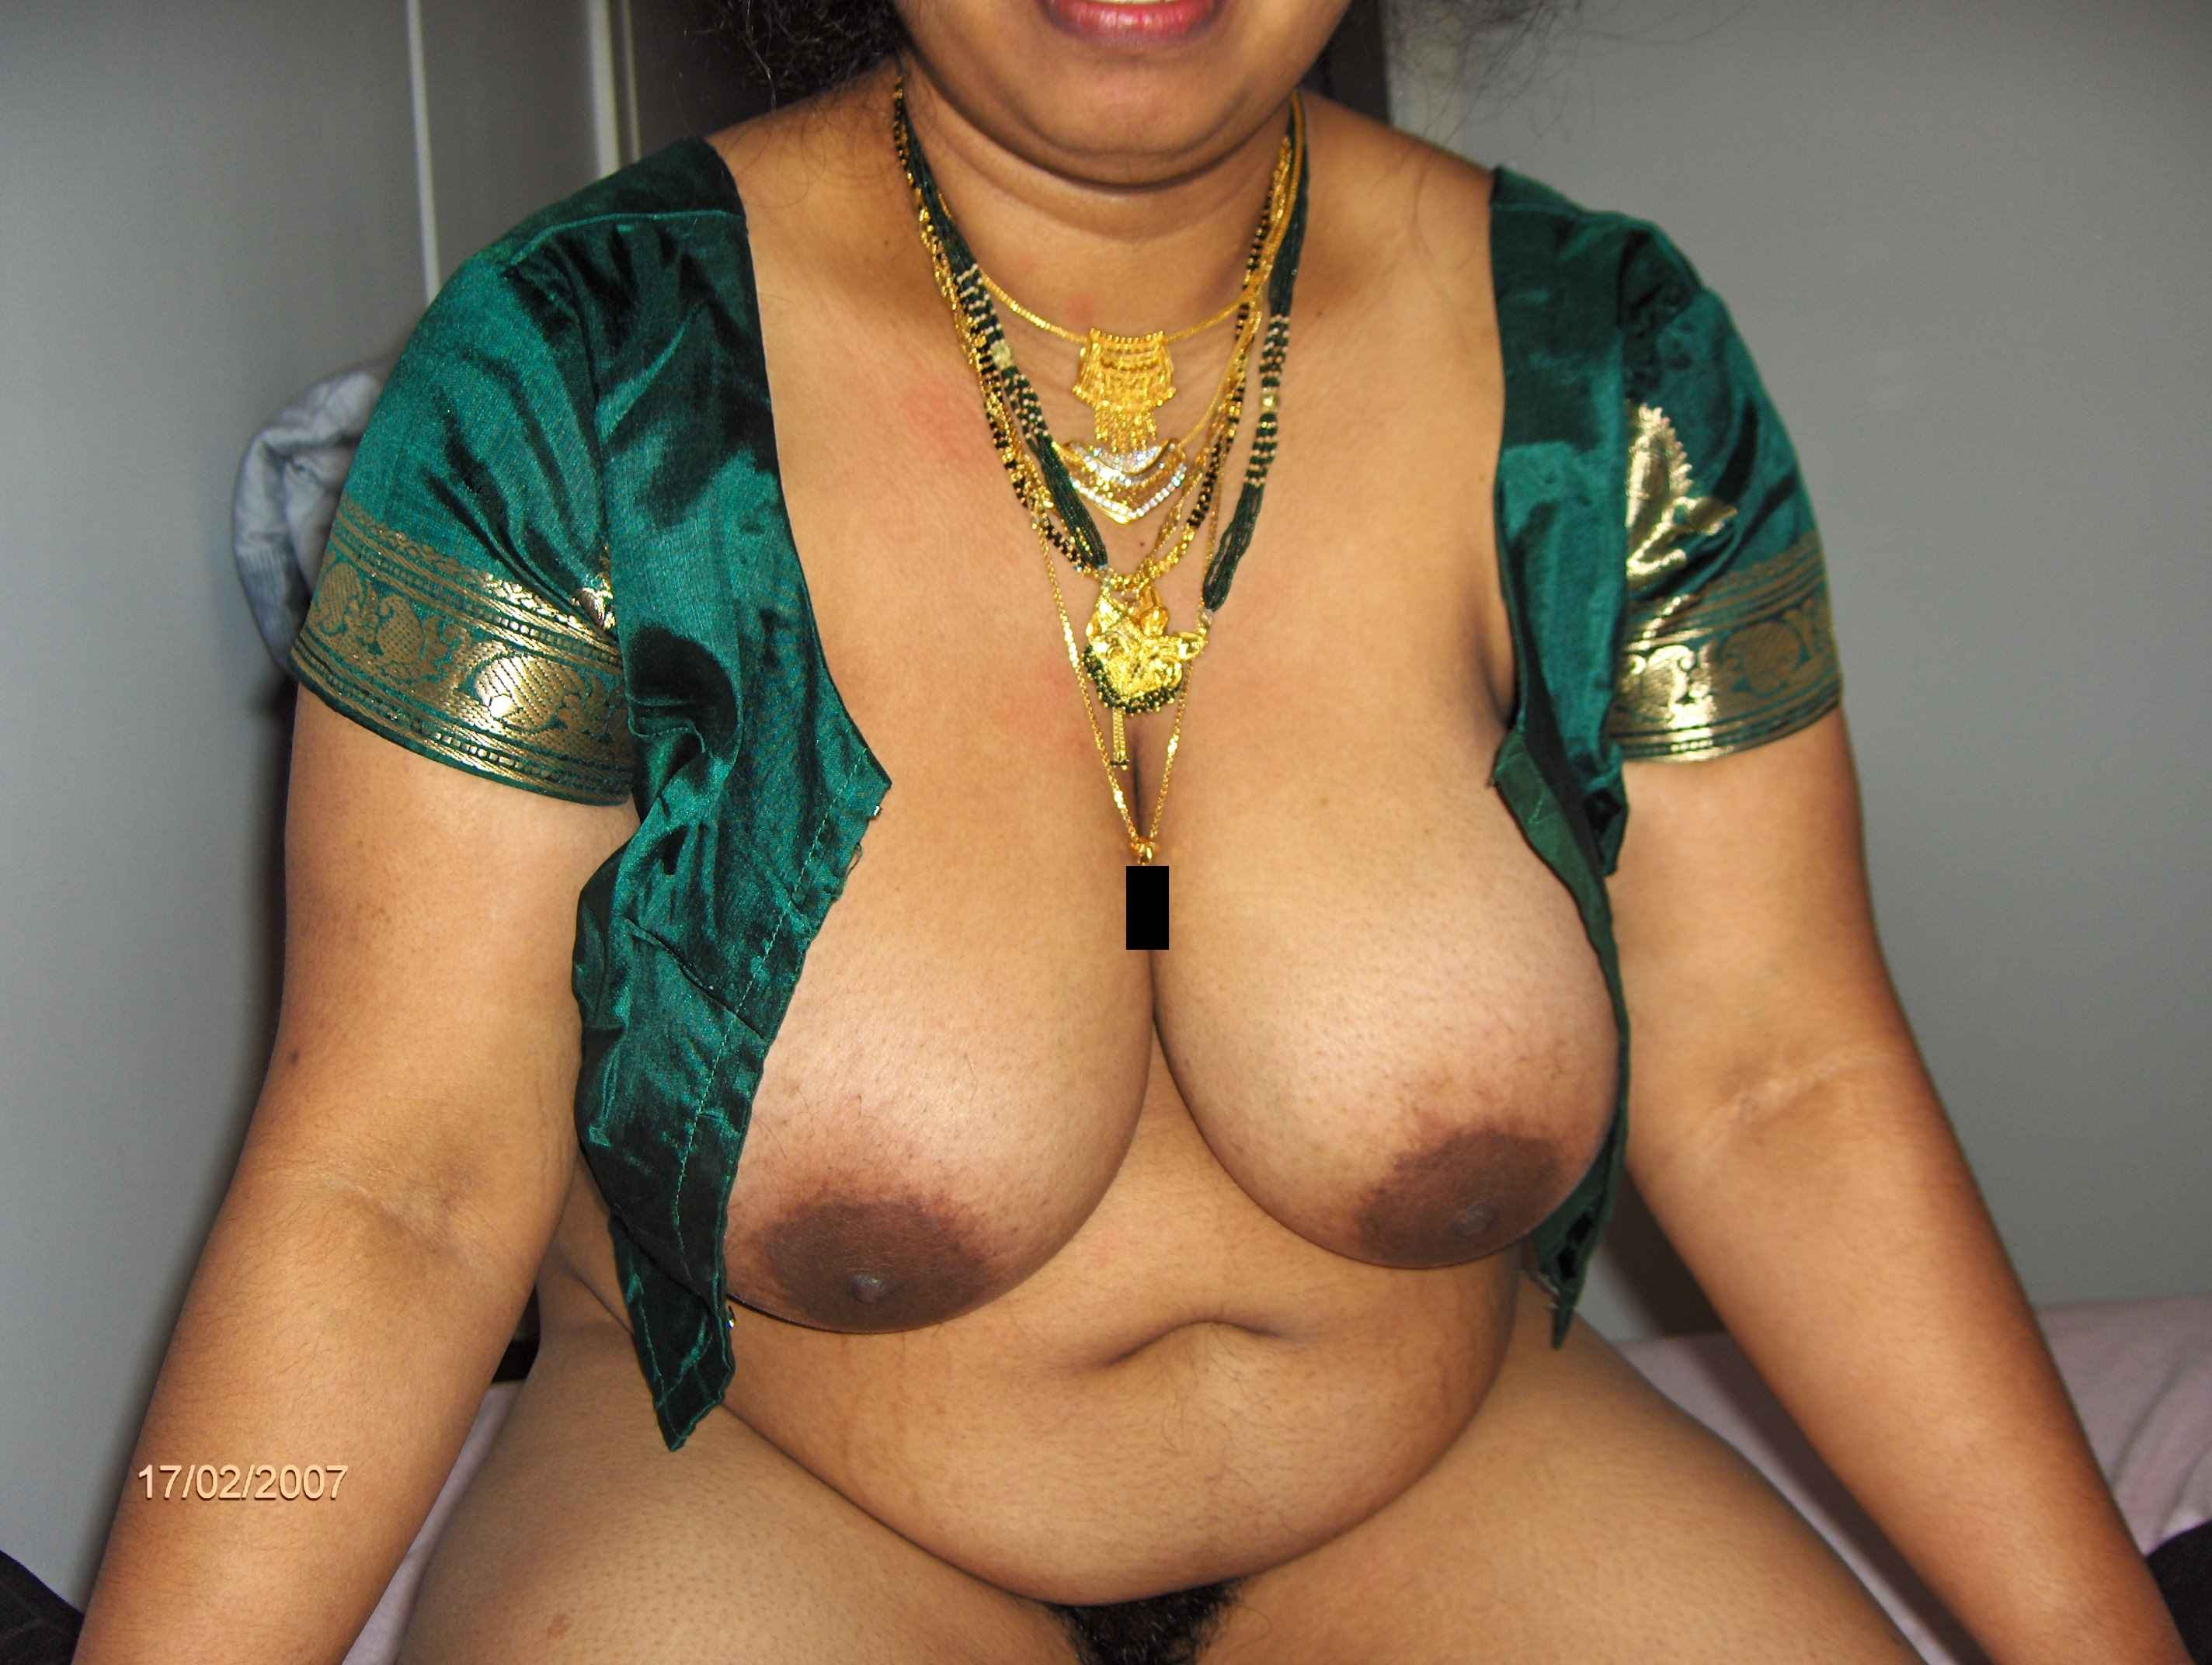 Туркмен секс фото, Голые и без одежды Туркменистанки, фото эротика 14 фотография